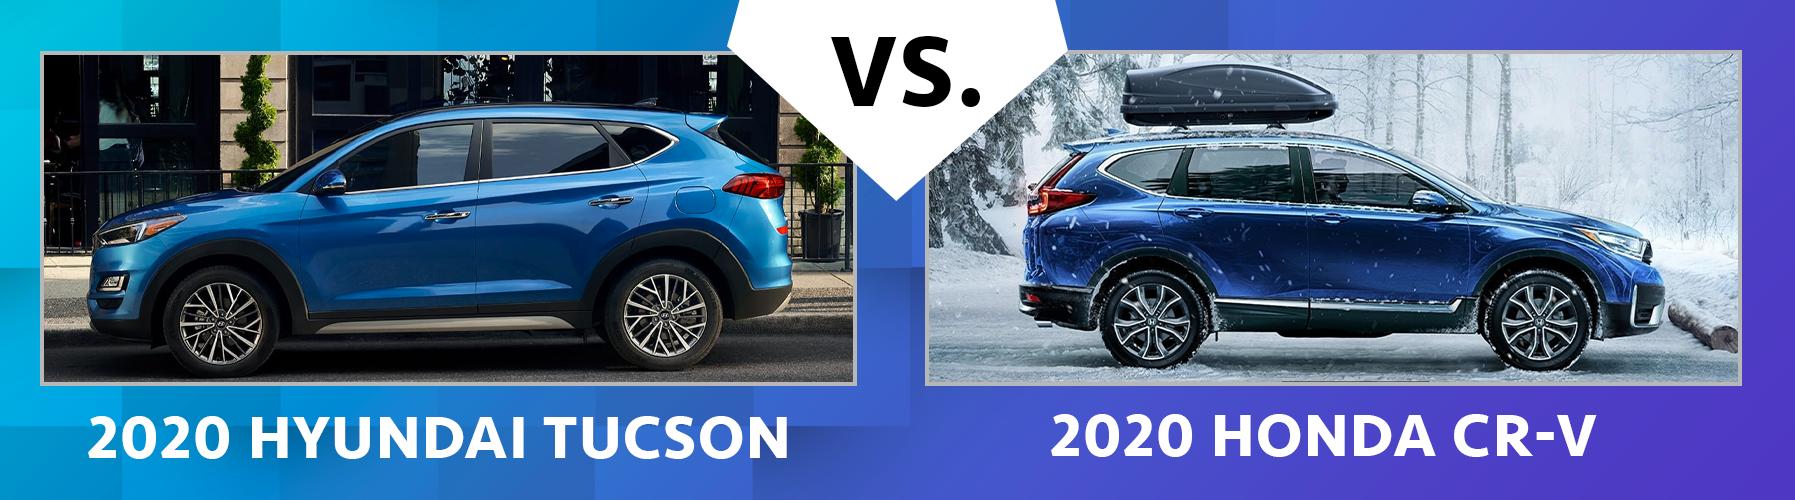 2020 Hyundai Tucson vs 2020 Honda CR-V Comfort Features